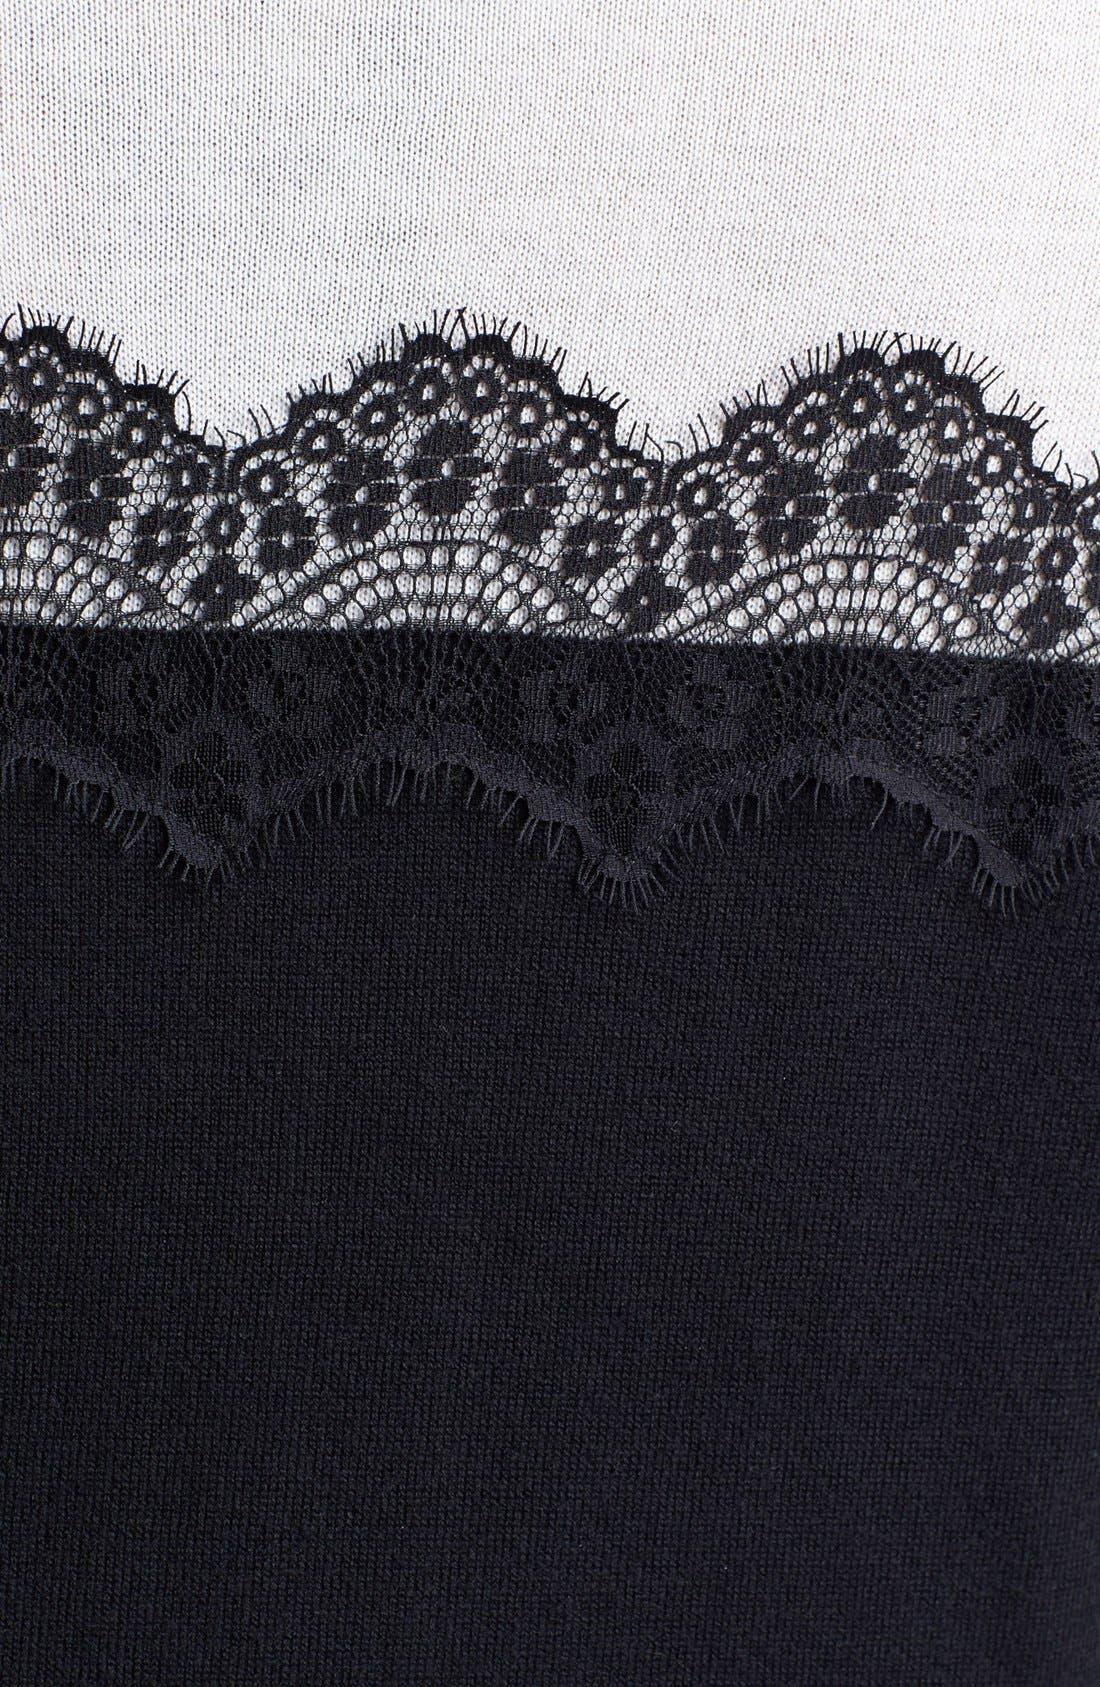 Alternate Image 3  - Vince Camuto Lace Trim Sweater (Plus Size)